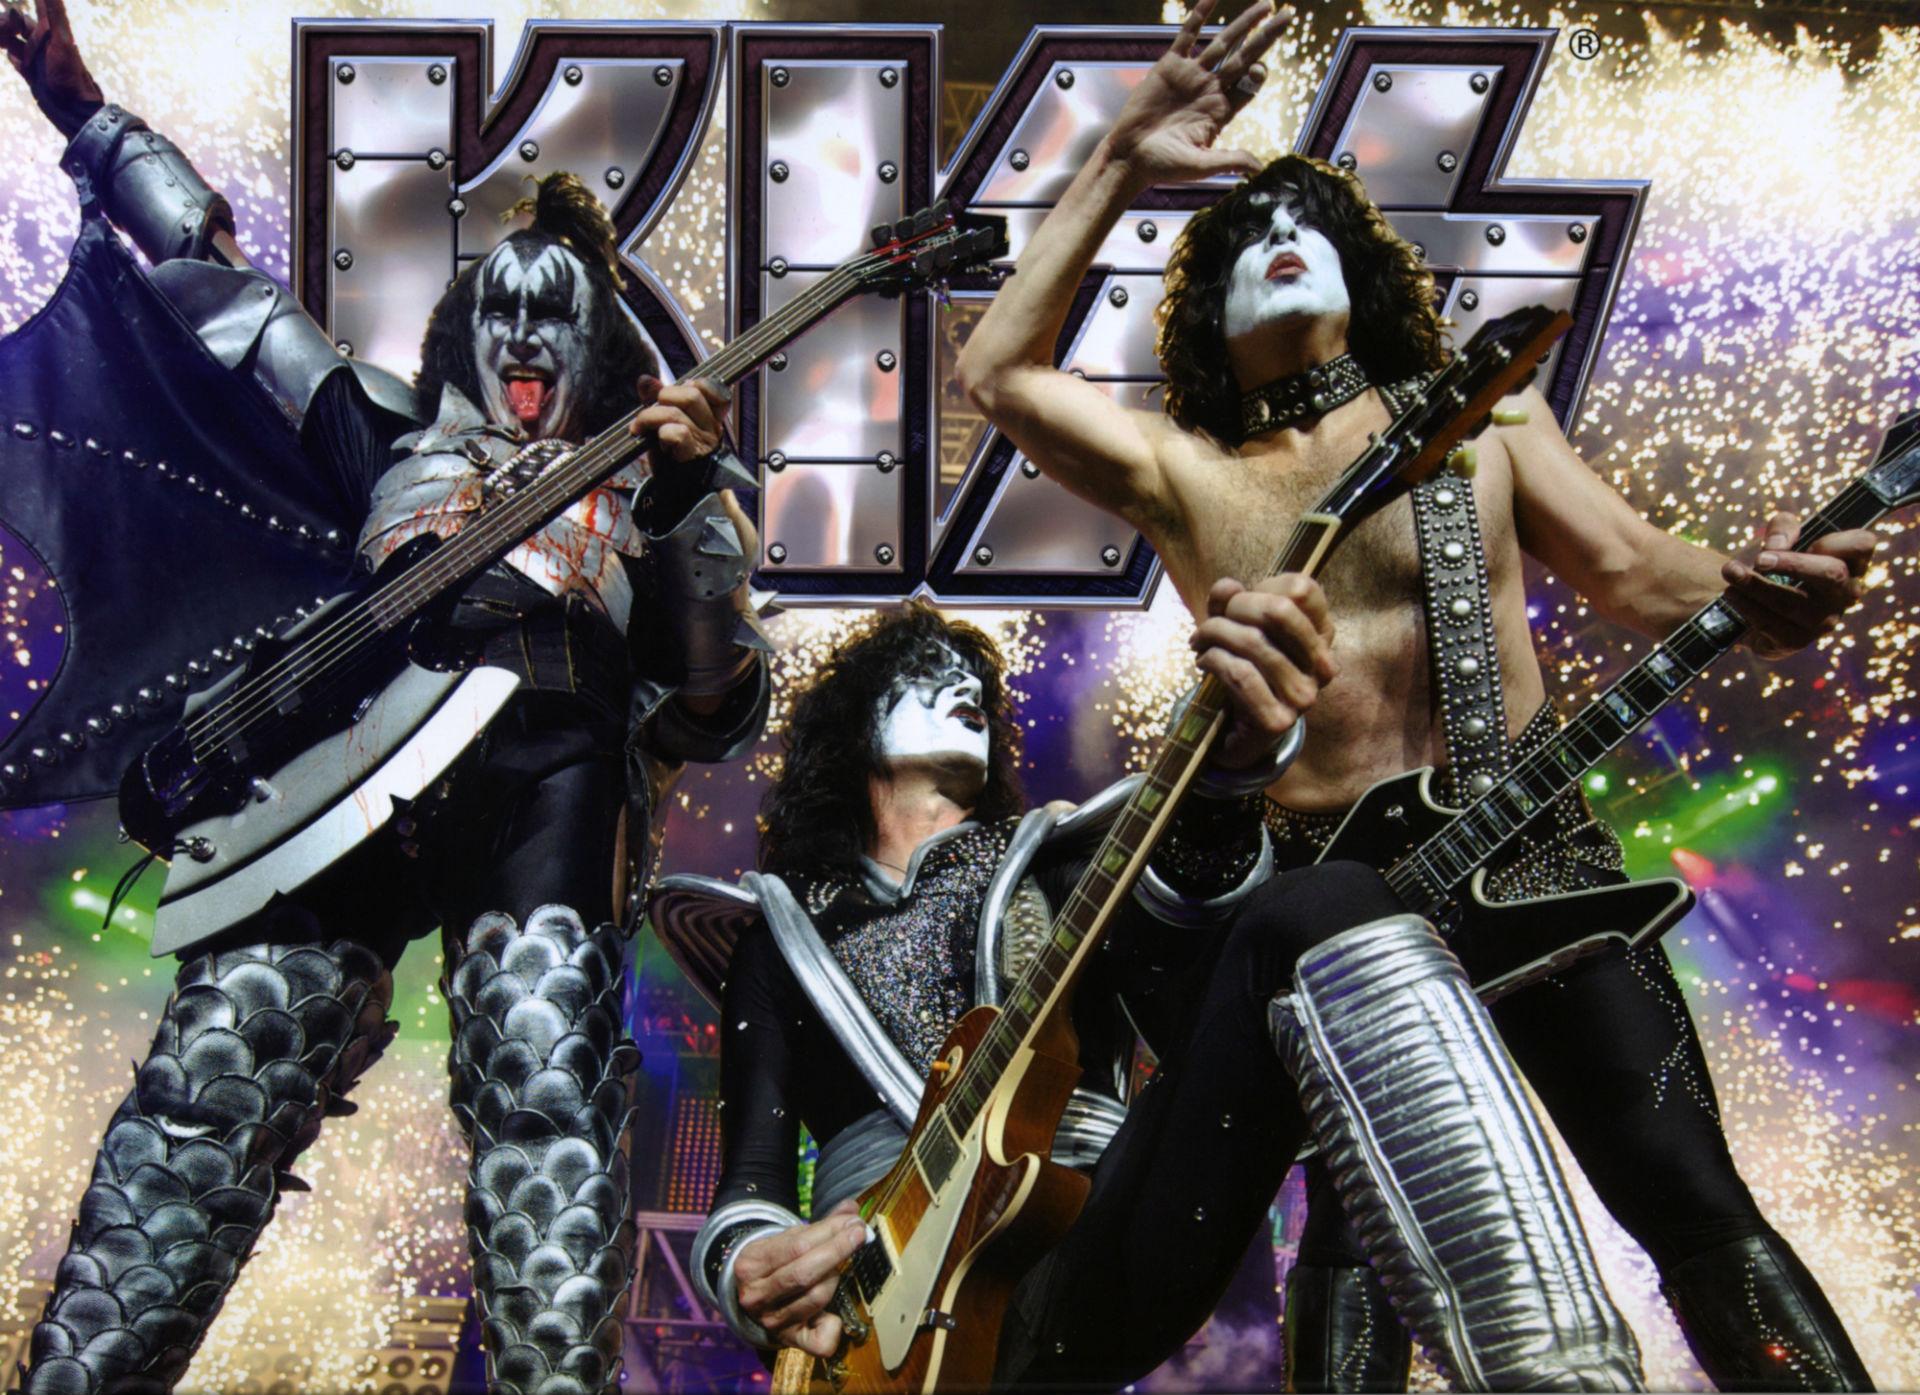 Kiss heavy metal rock bands concert guitar f wallpaper background 1920x1395